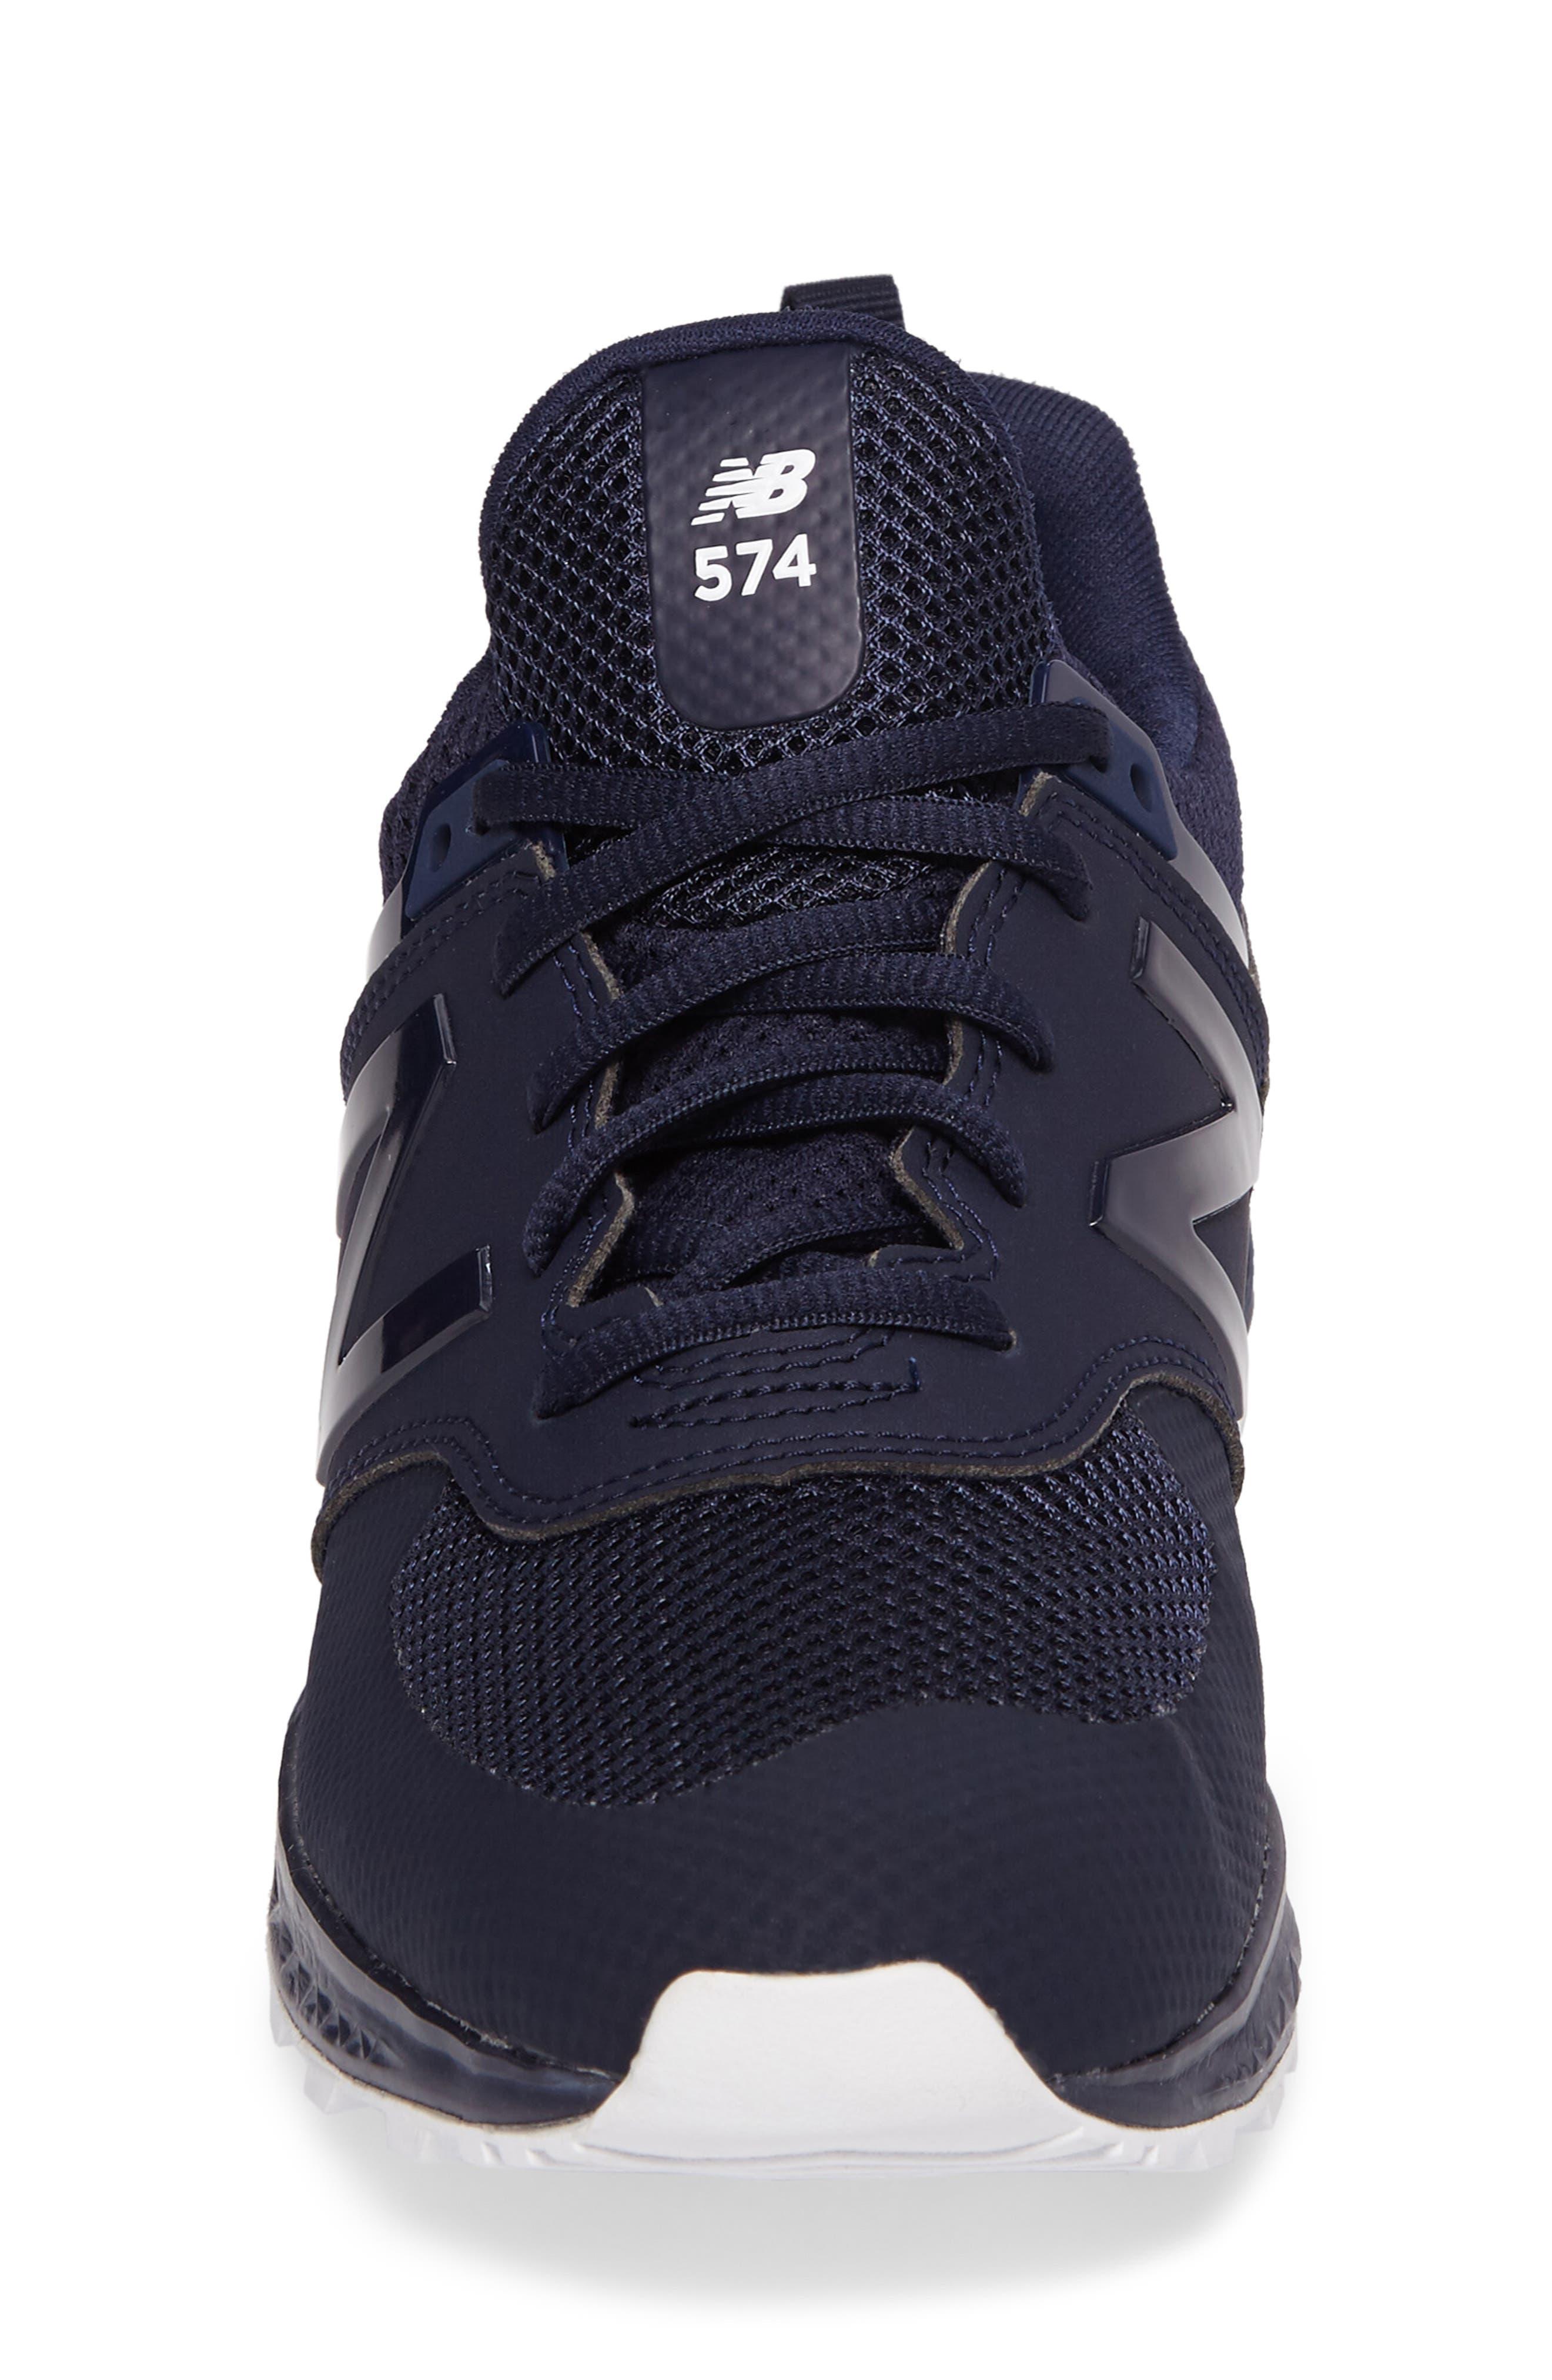 Alternate Image 4  - New Balance 574 Sport Sneaker (Baby, Walker, Toddler, Little Kid & Big Kid)